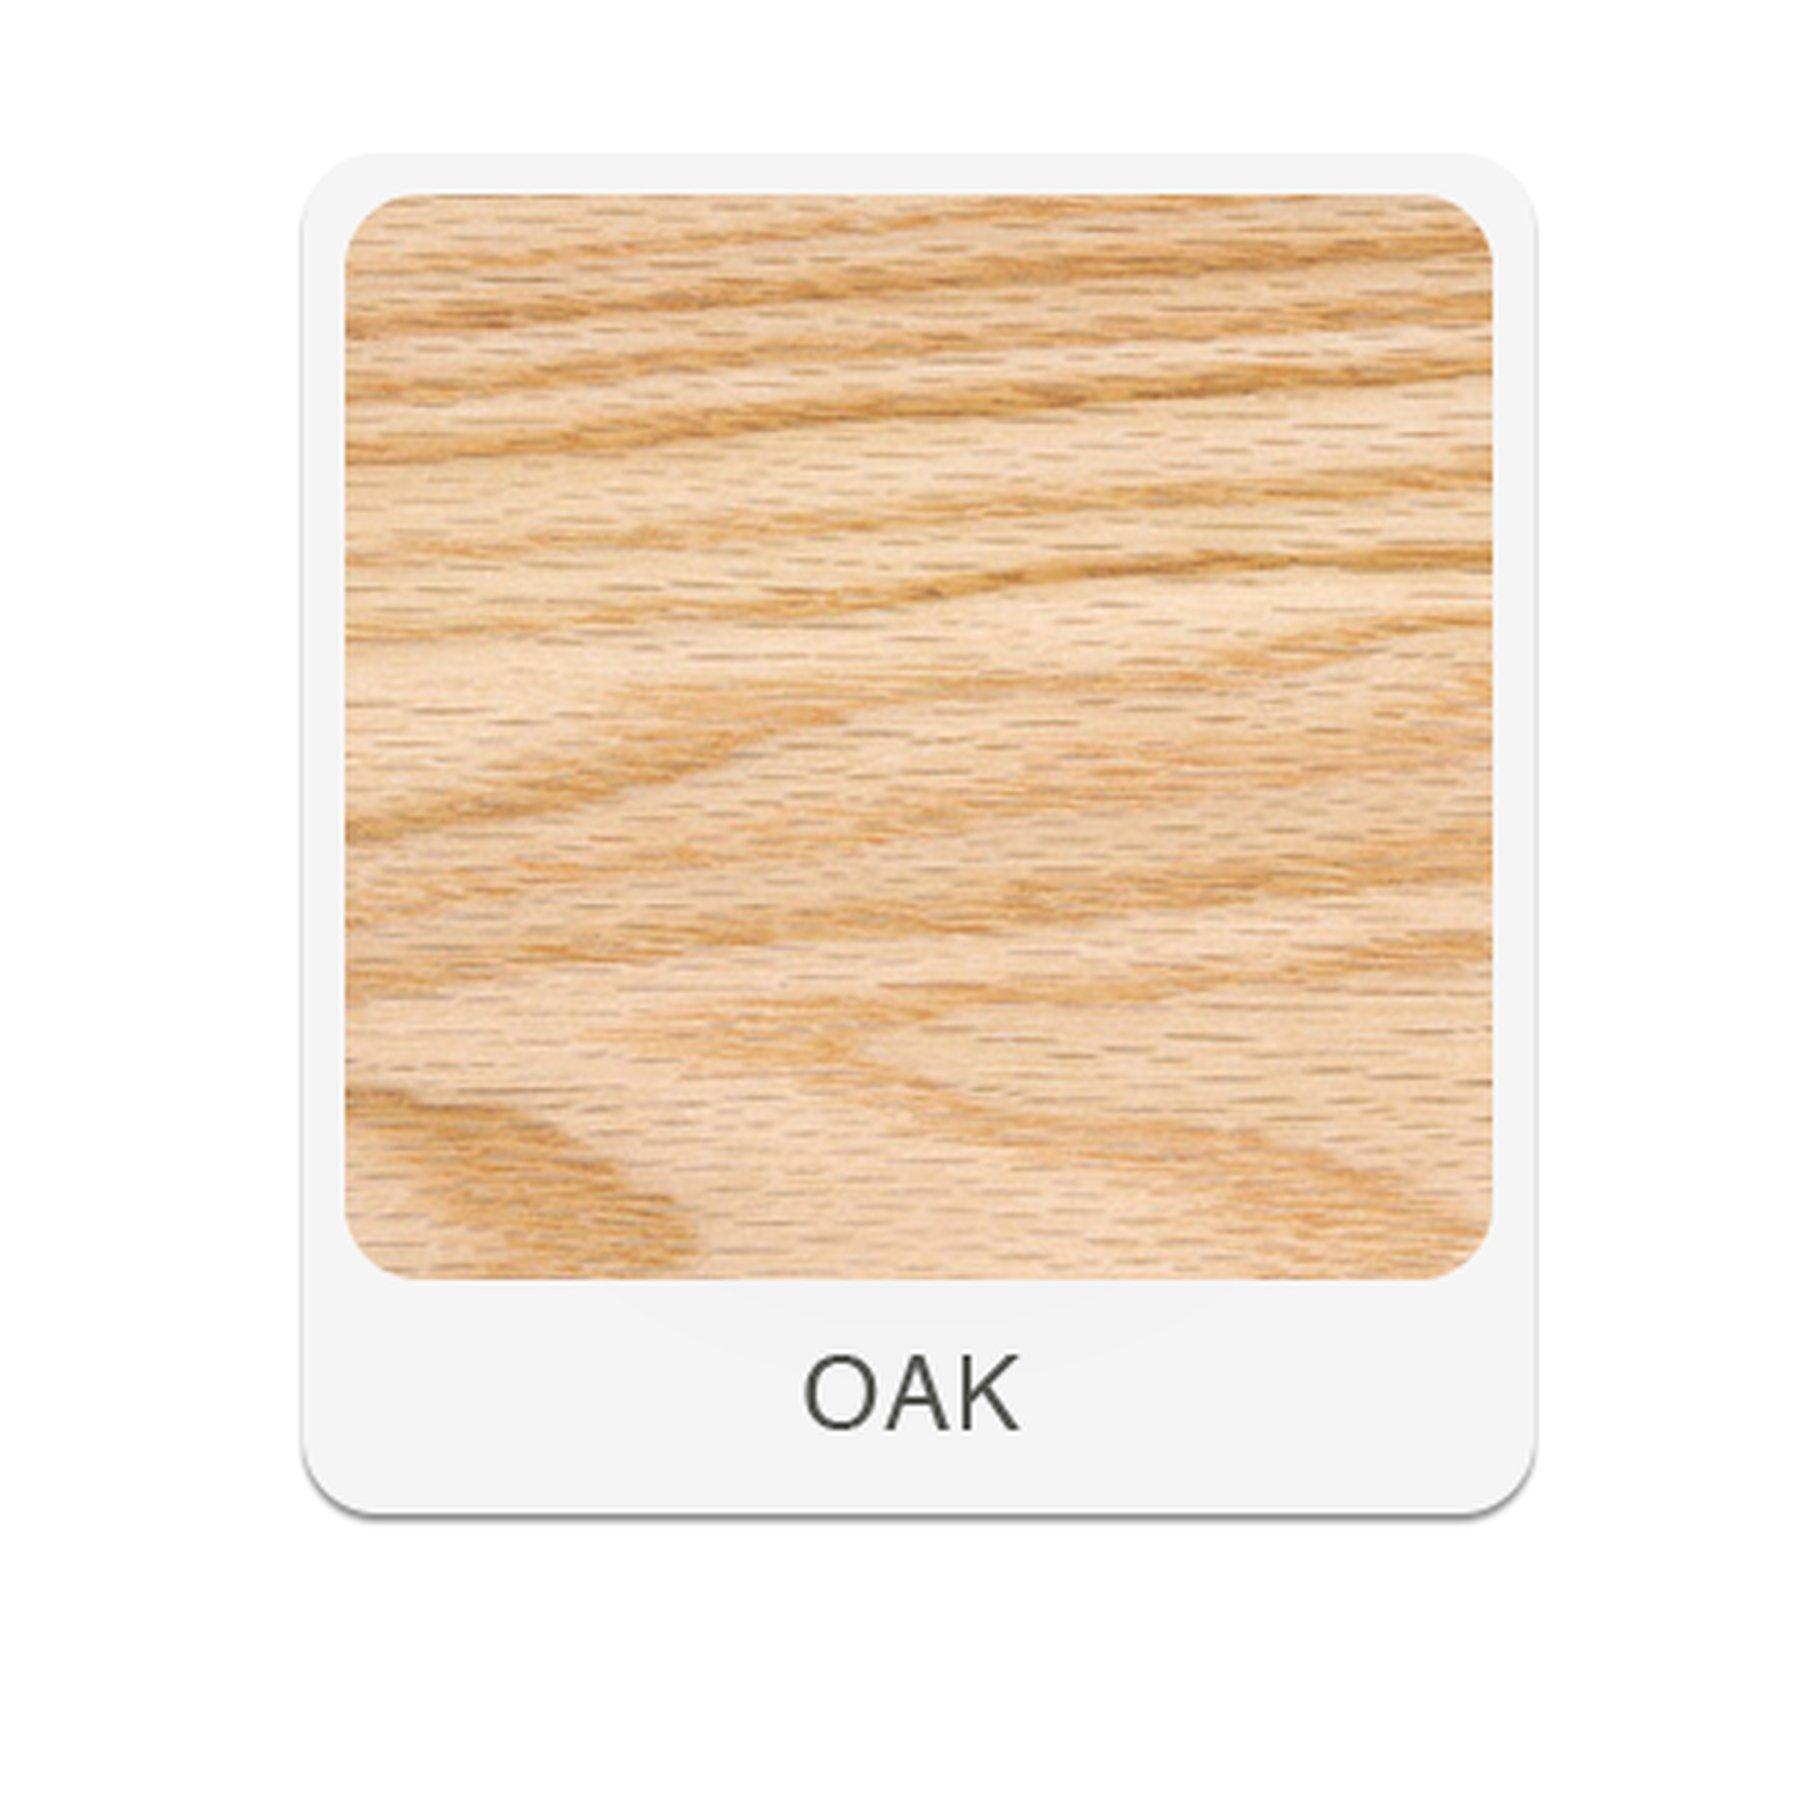 Diversified Woodcrafts P7301K30N - 24''x72'' - 30'' High, Plain Apron Laboratory Table, Red Oak Legs & Apron, Plastic Laminate Top, Made in USA by Diversified Woodcrafts (Image #4)